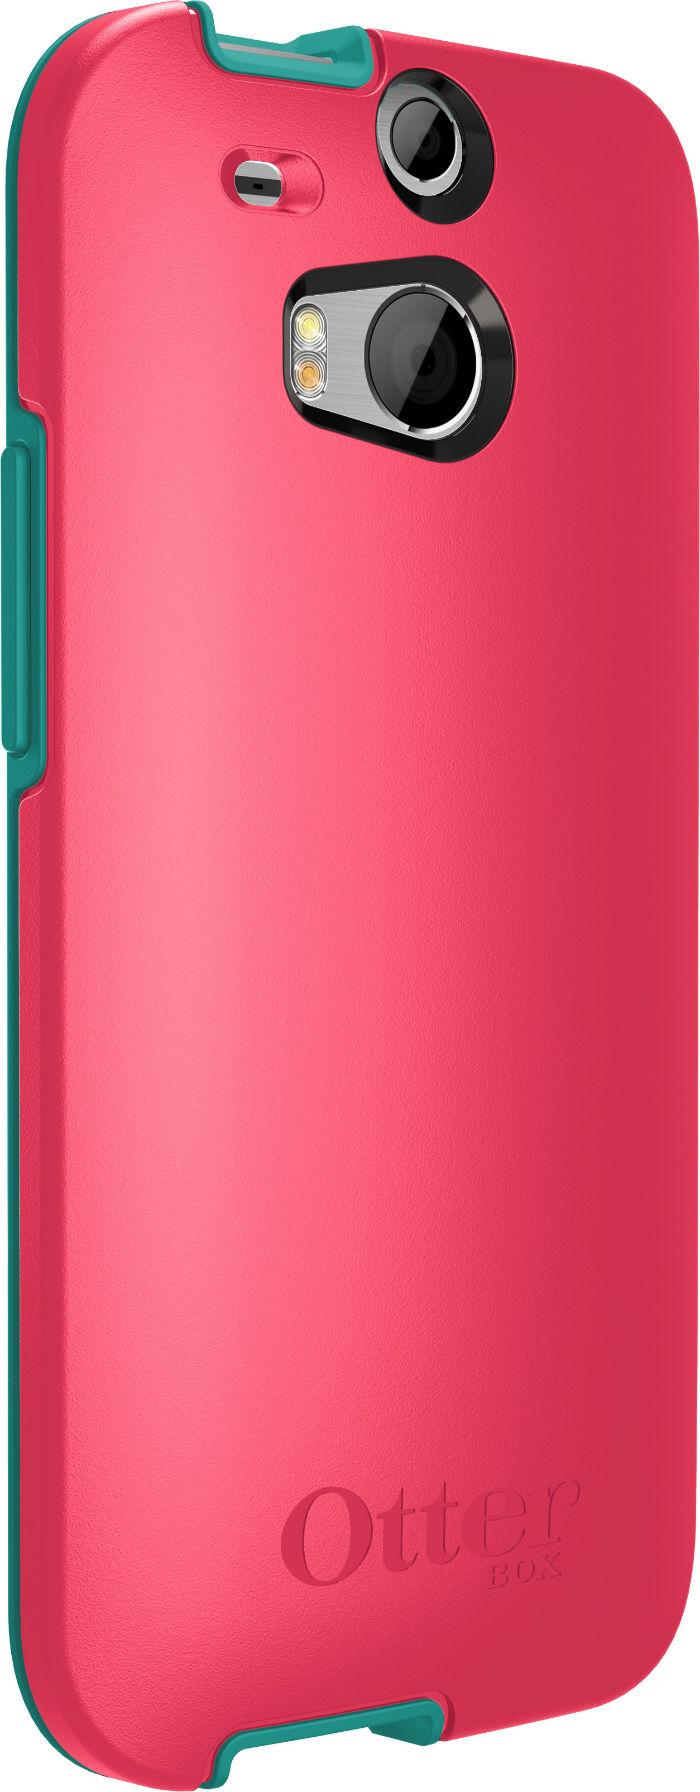 HTC28-CHARLESTON-4Q-brd